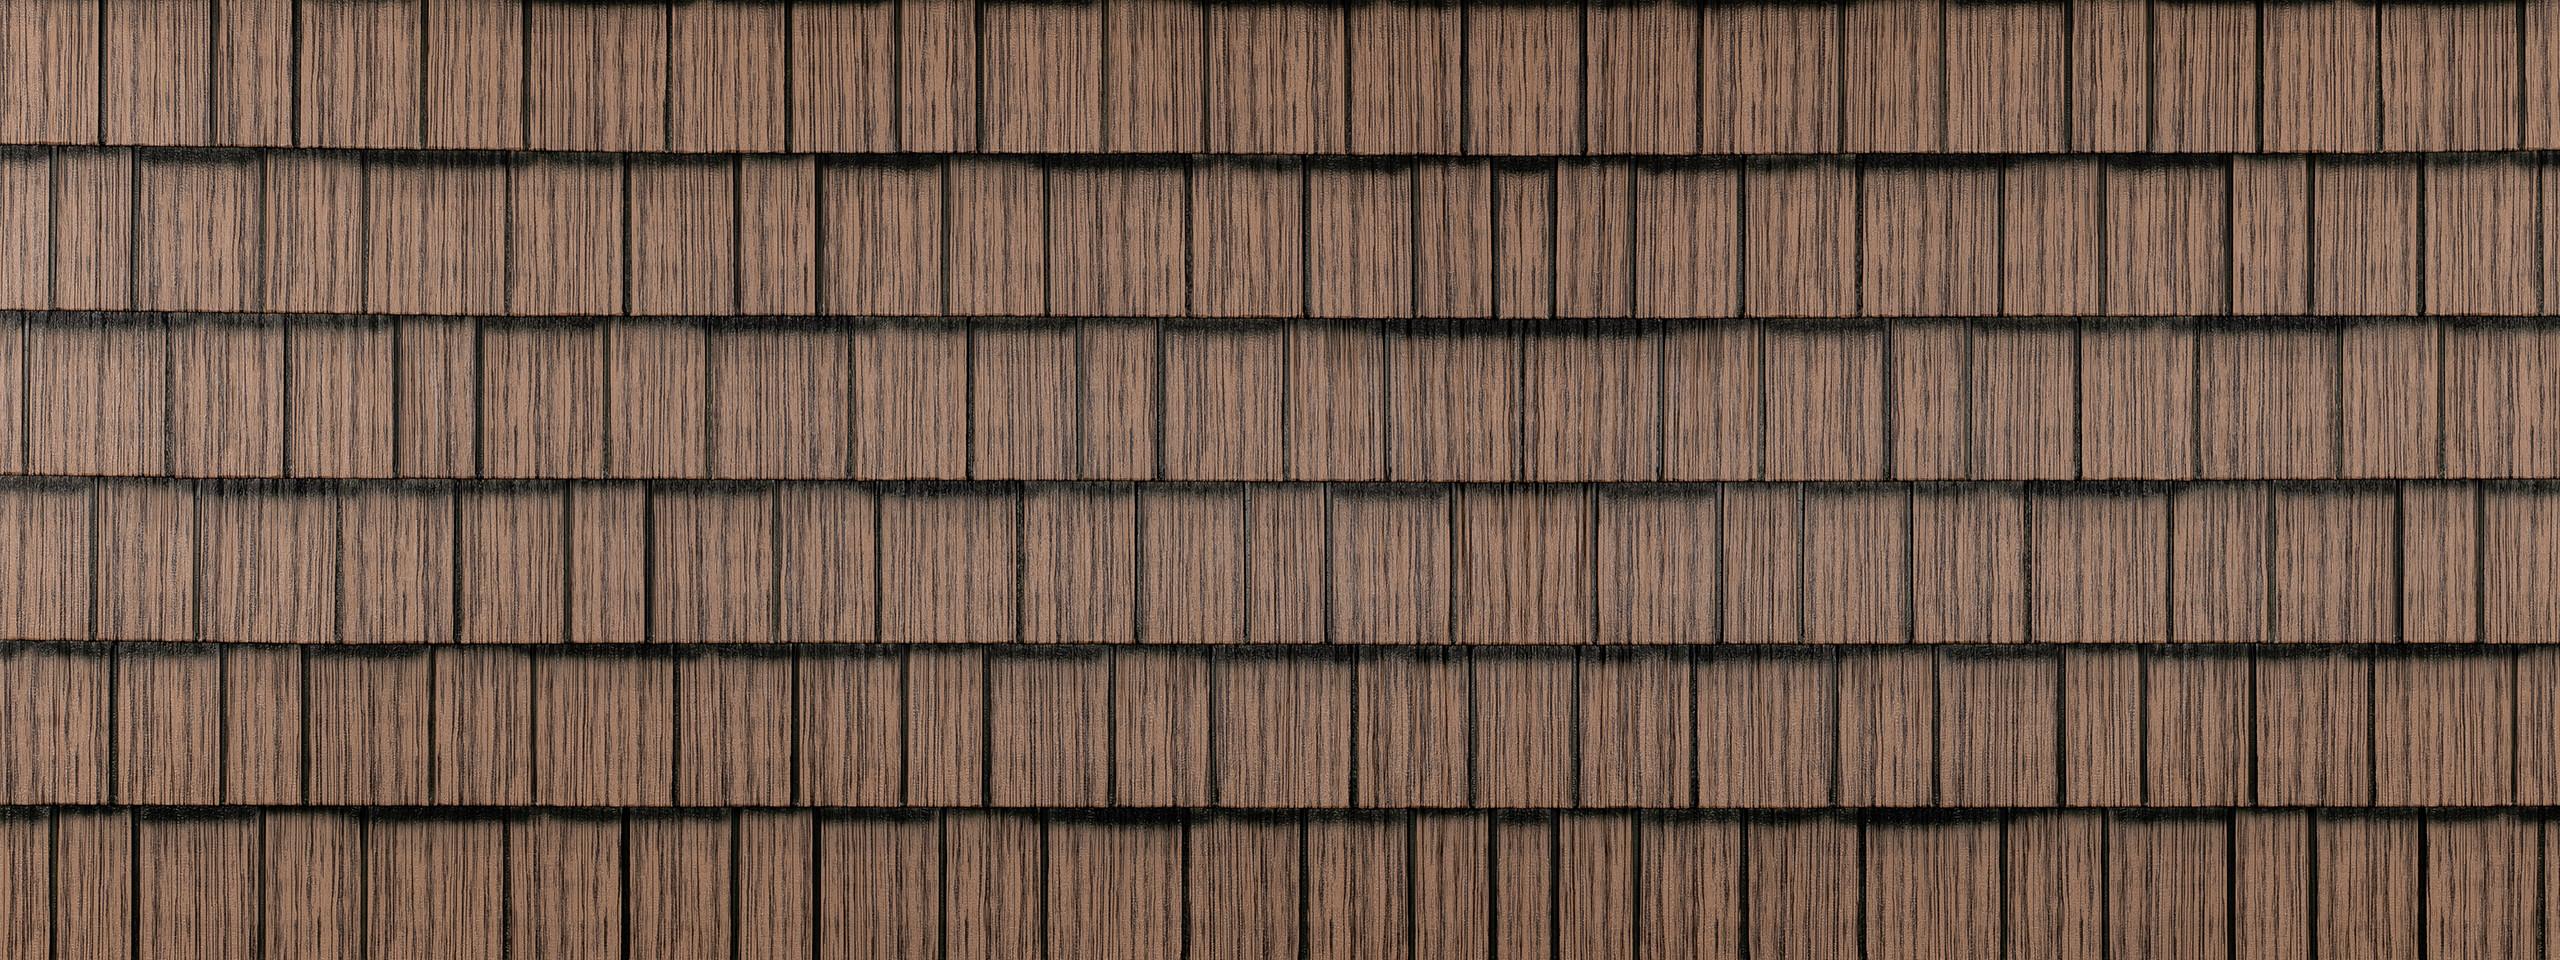 Cedar generations hd shake steel roofing